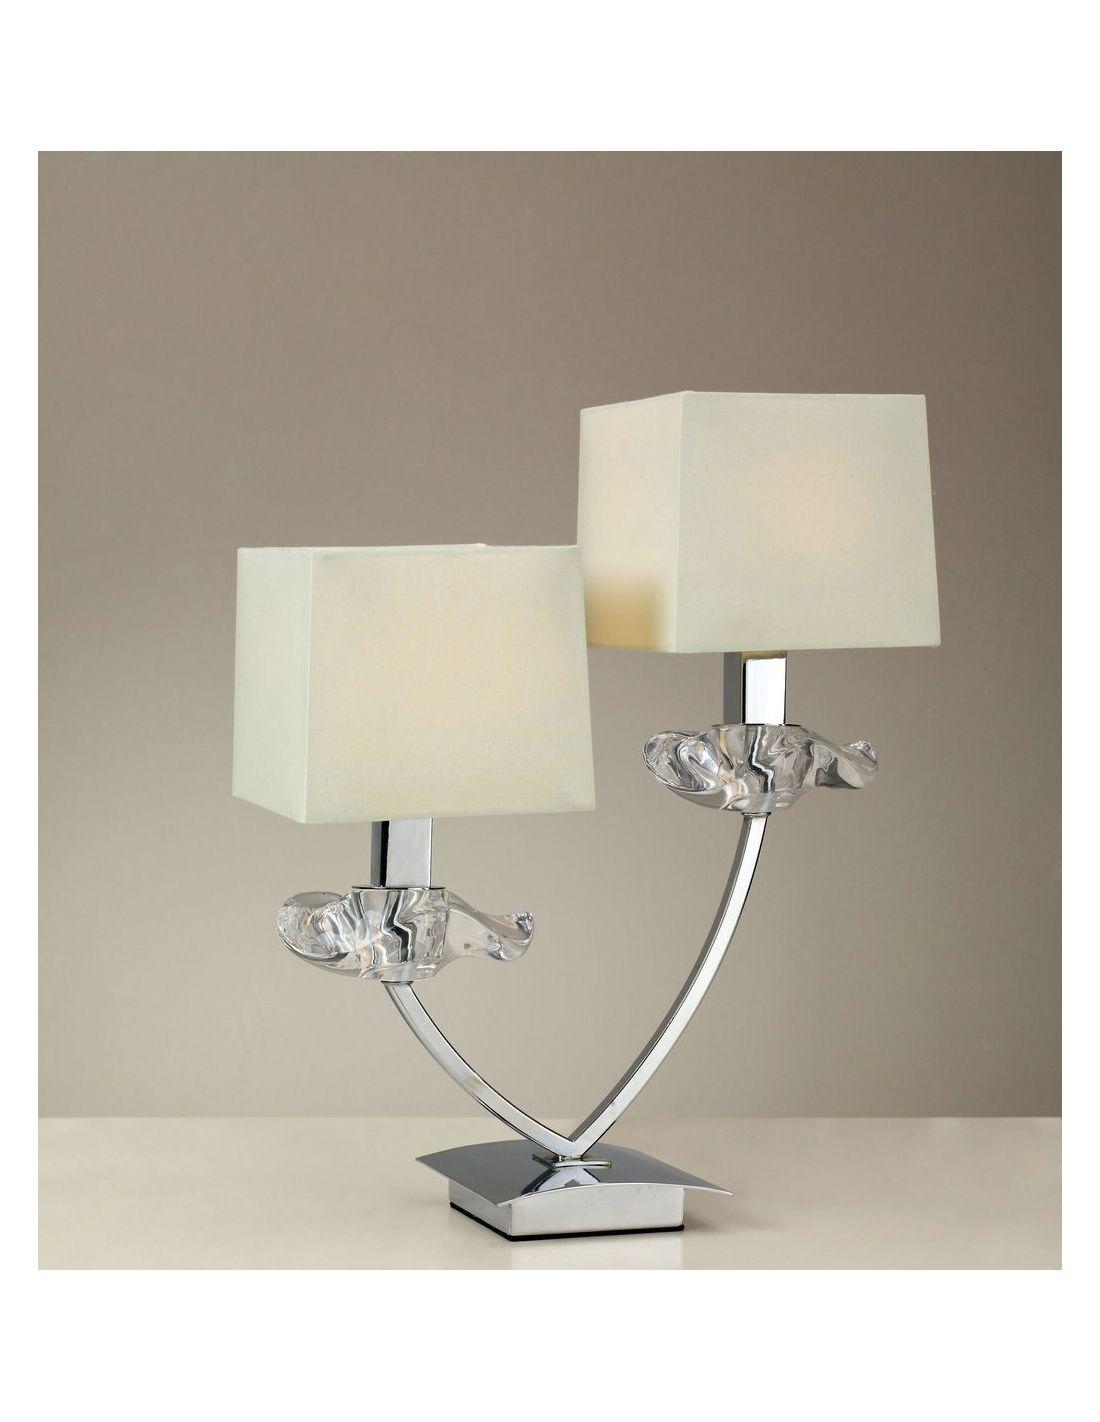 Lamparas lamparas modernas lamparas de techo modernas - Pantallas de lamparas de mesa ...